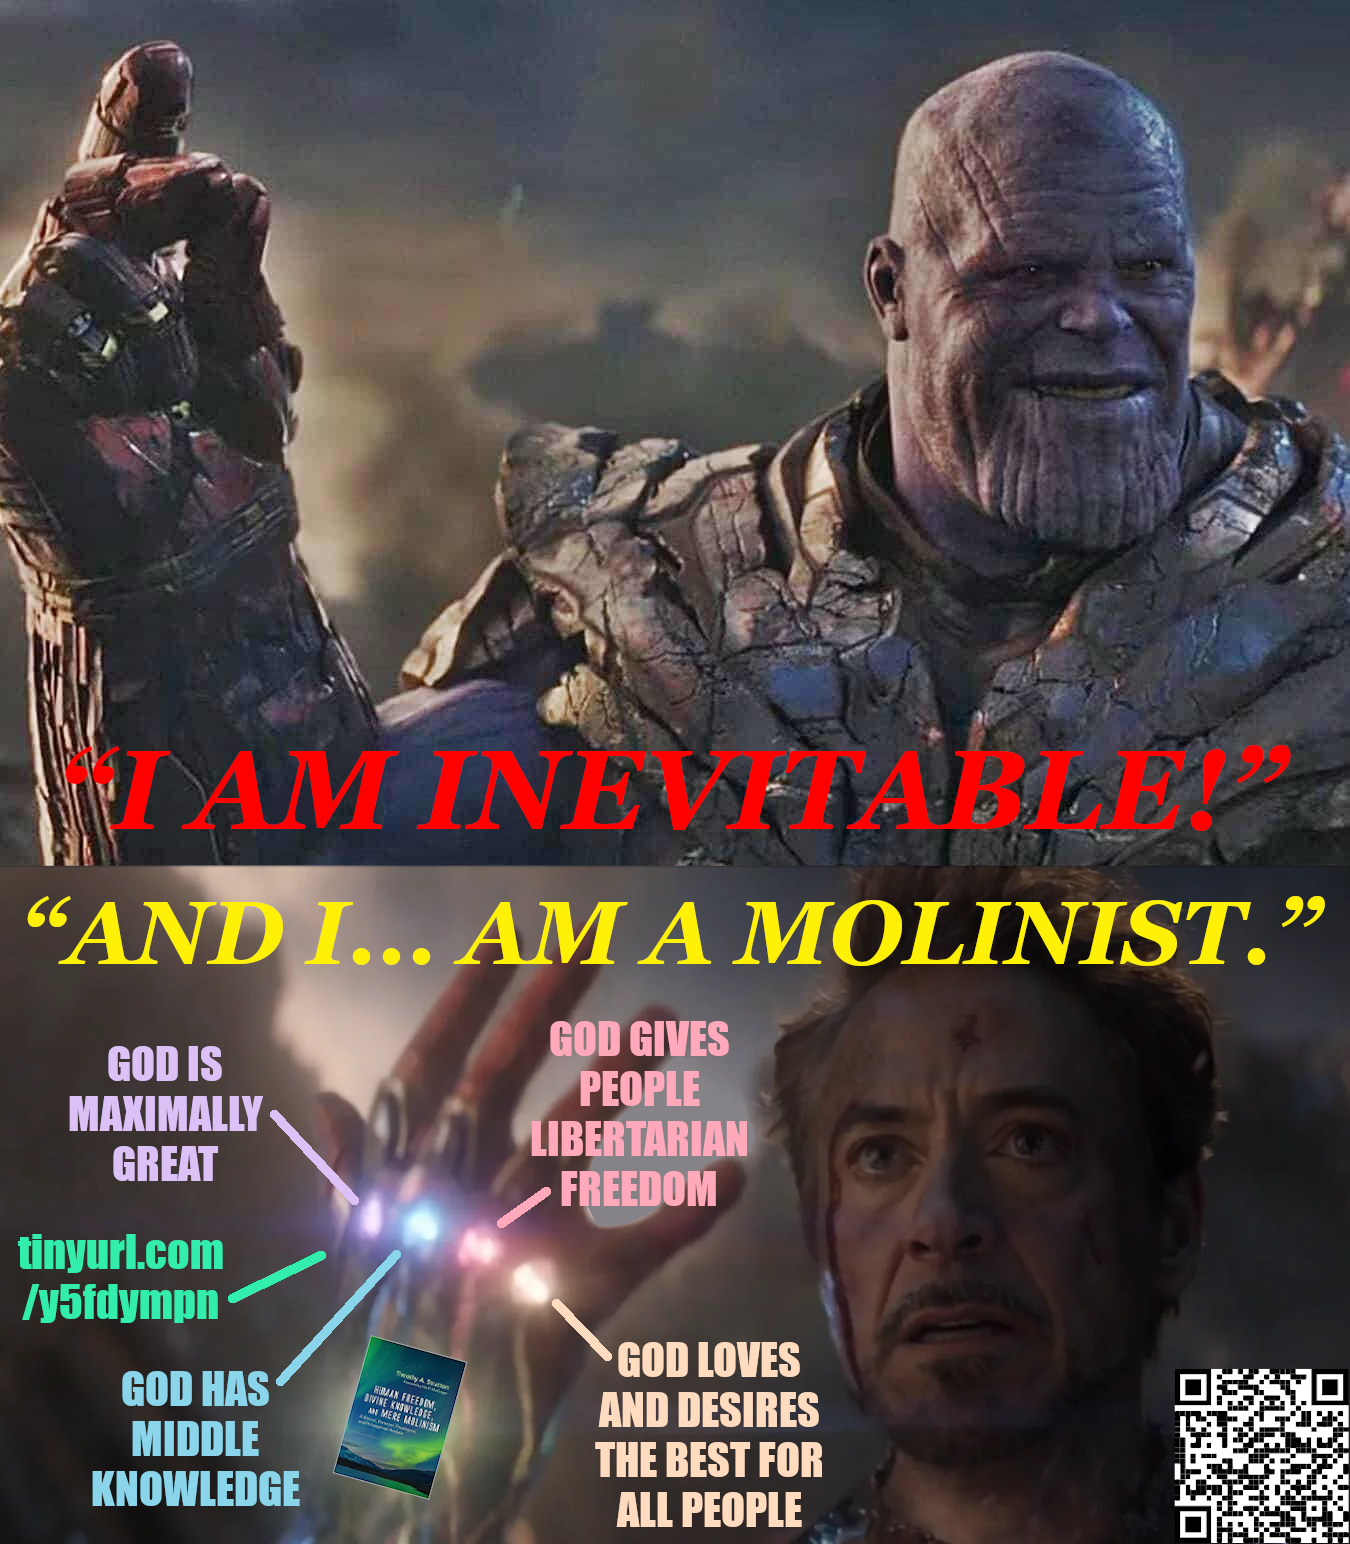 https://scottthong.files.wordpress.com/2020/11/infinitymolinist.png